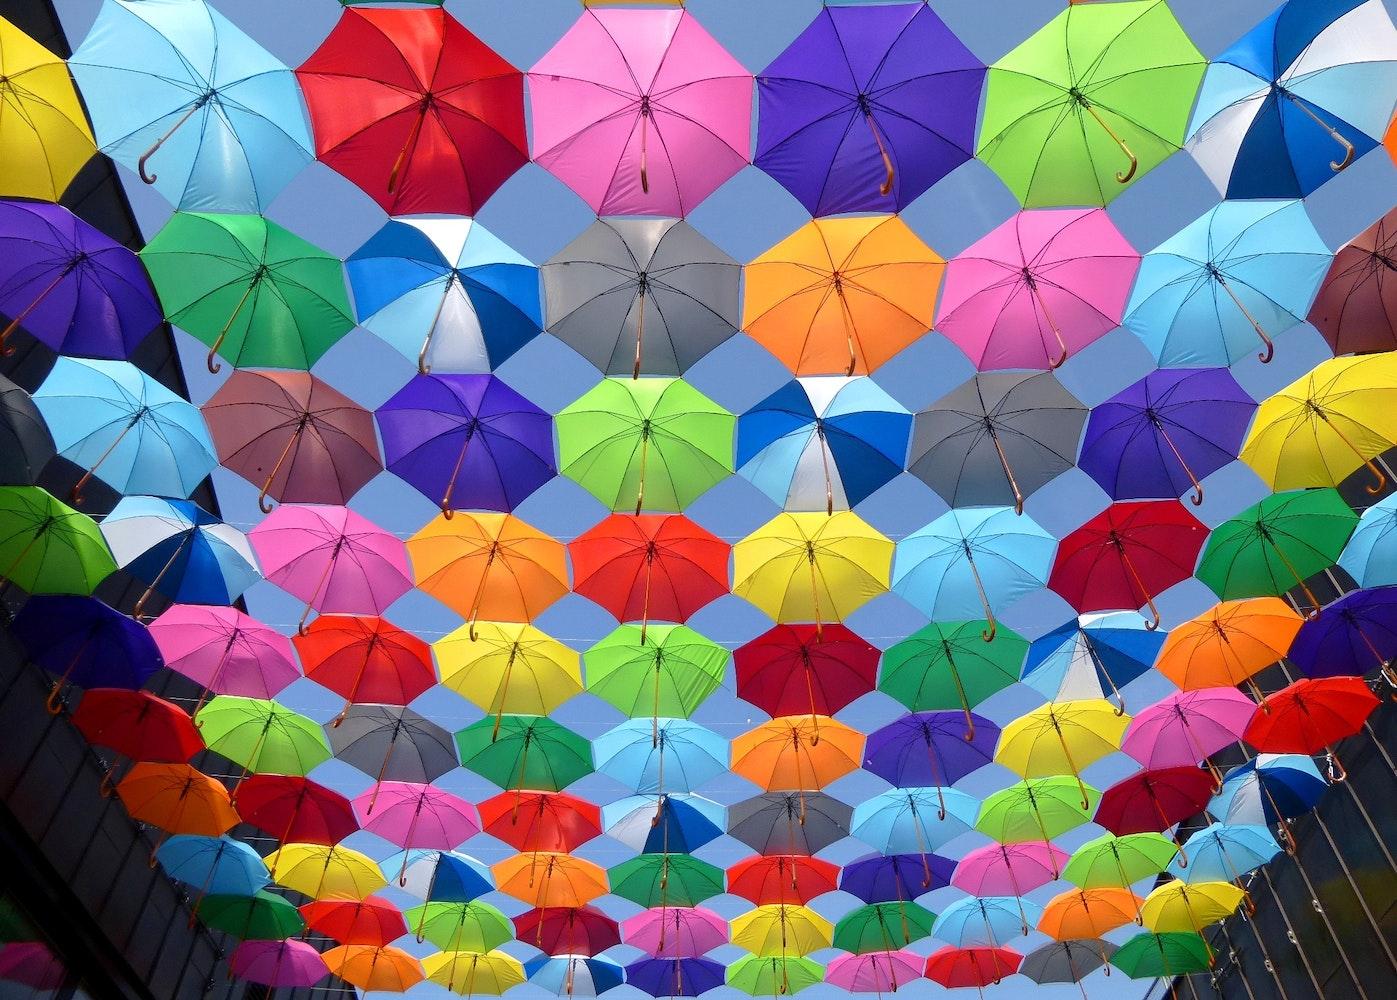 Interesting Colourful Photos Pexels Free Stock Photos